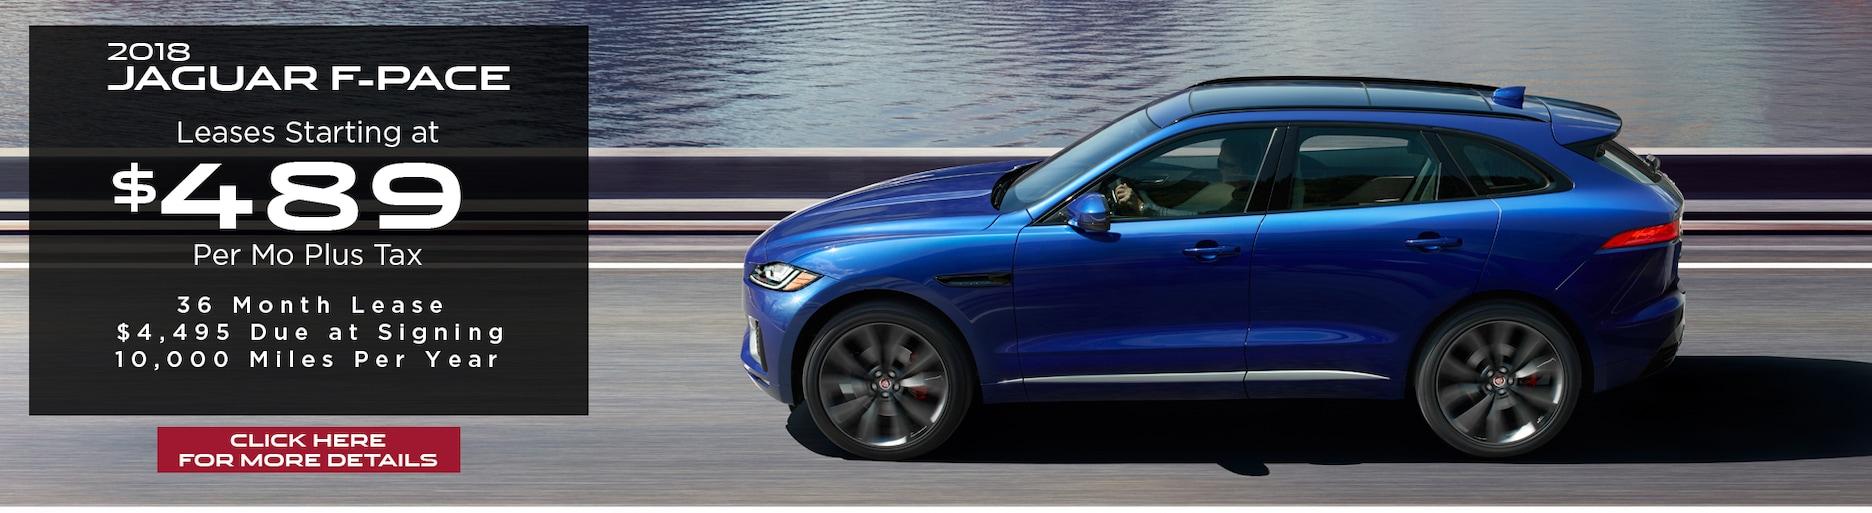 nyias photos near me york new autonation floor dealers xf pounces auto s show jaguar